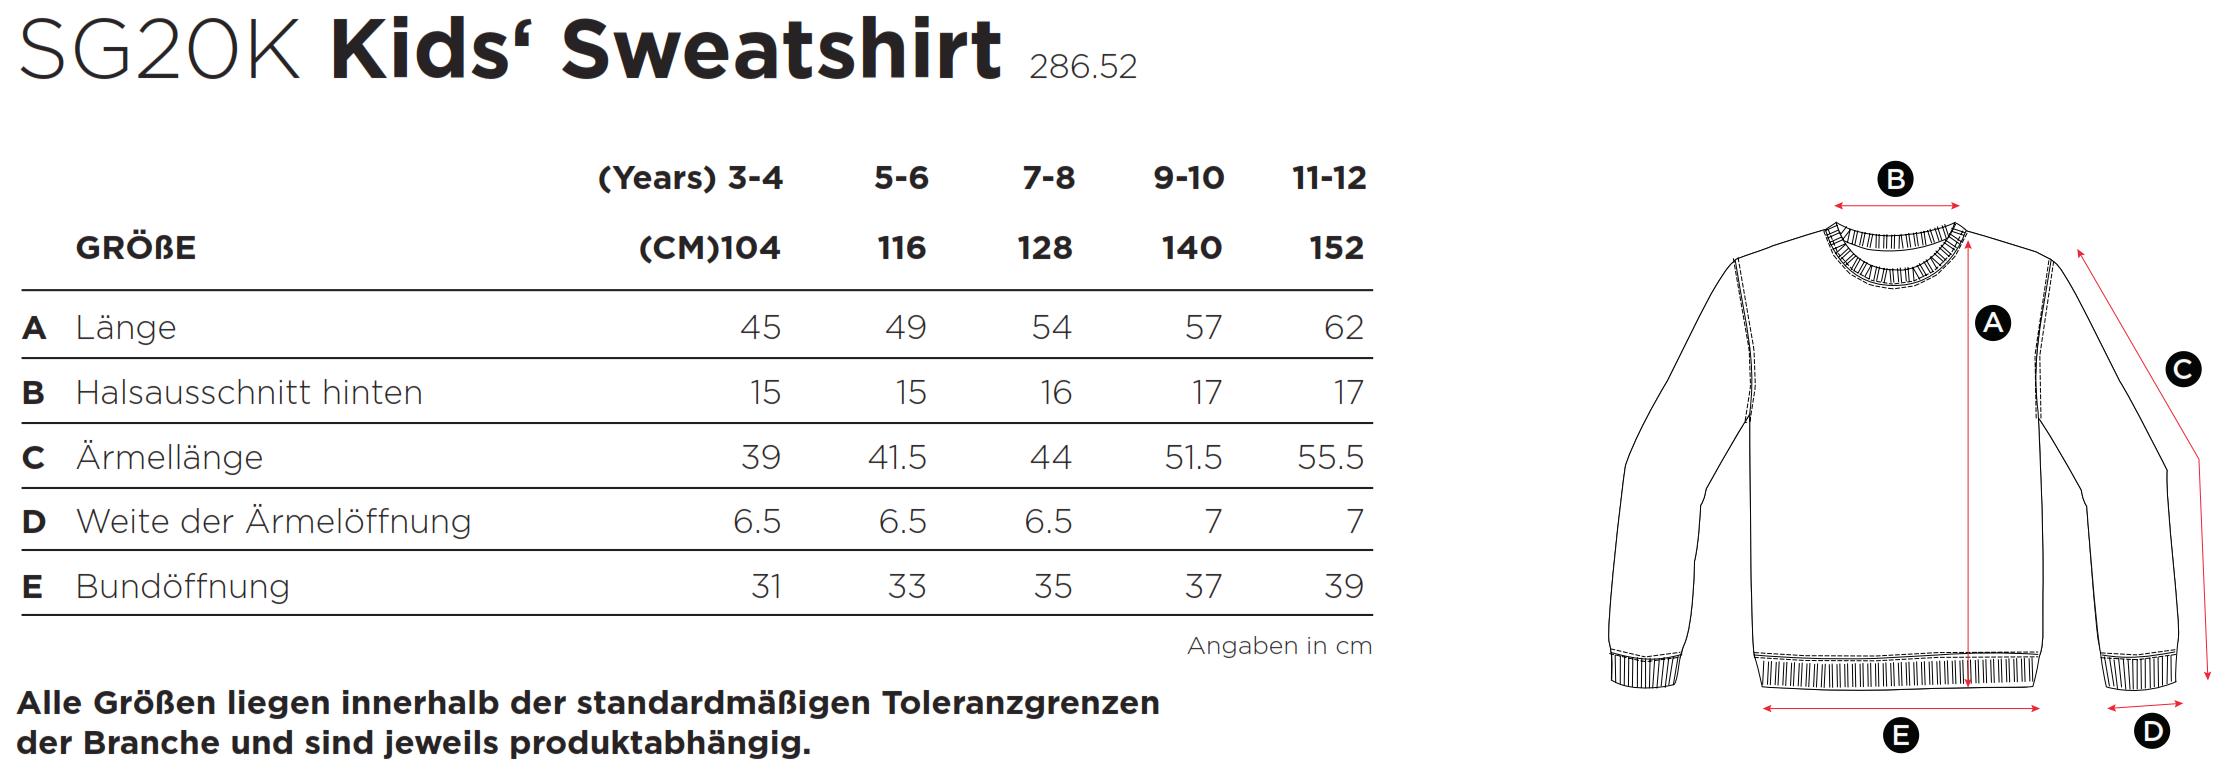 SG: Kids` Sweatshirt SG20K